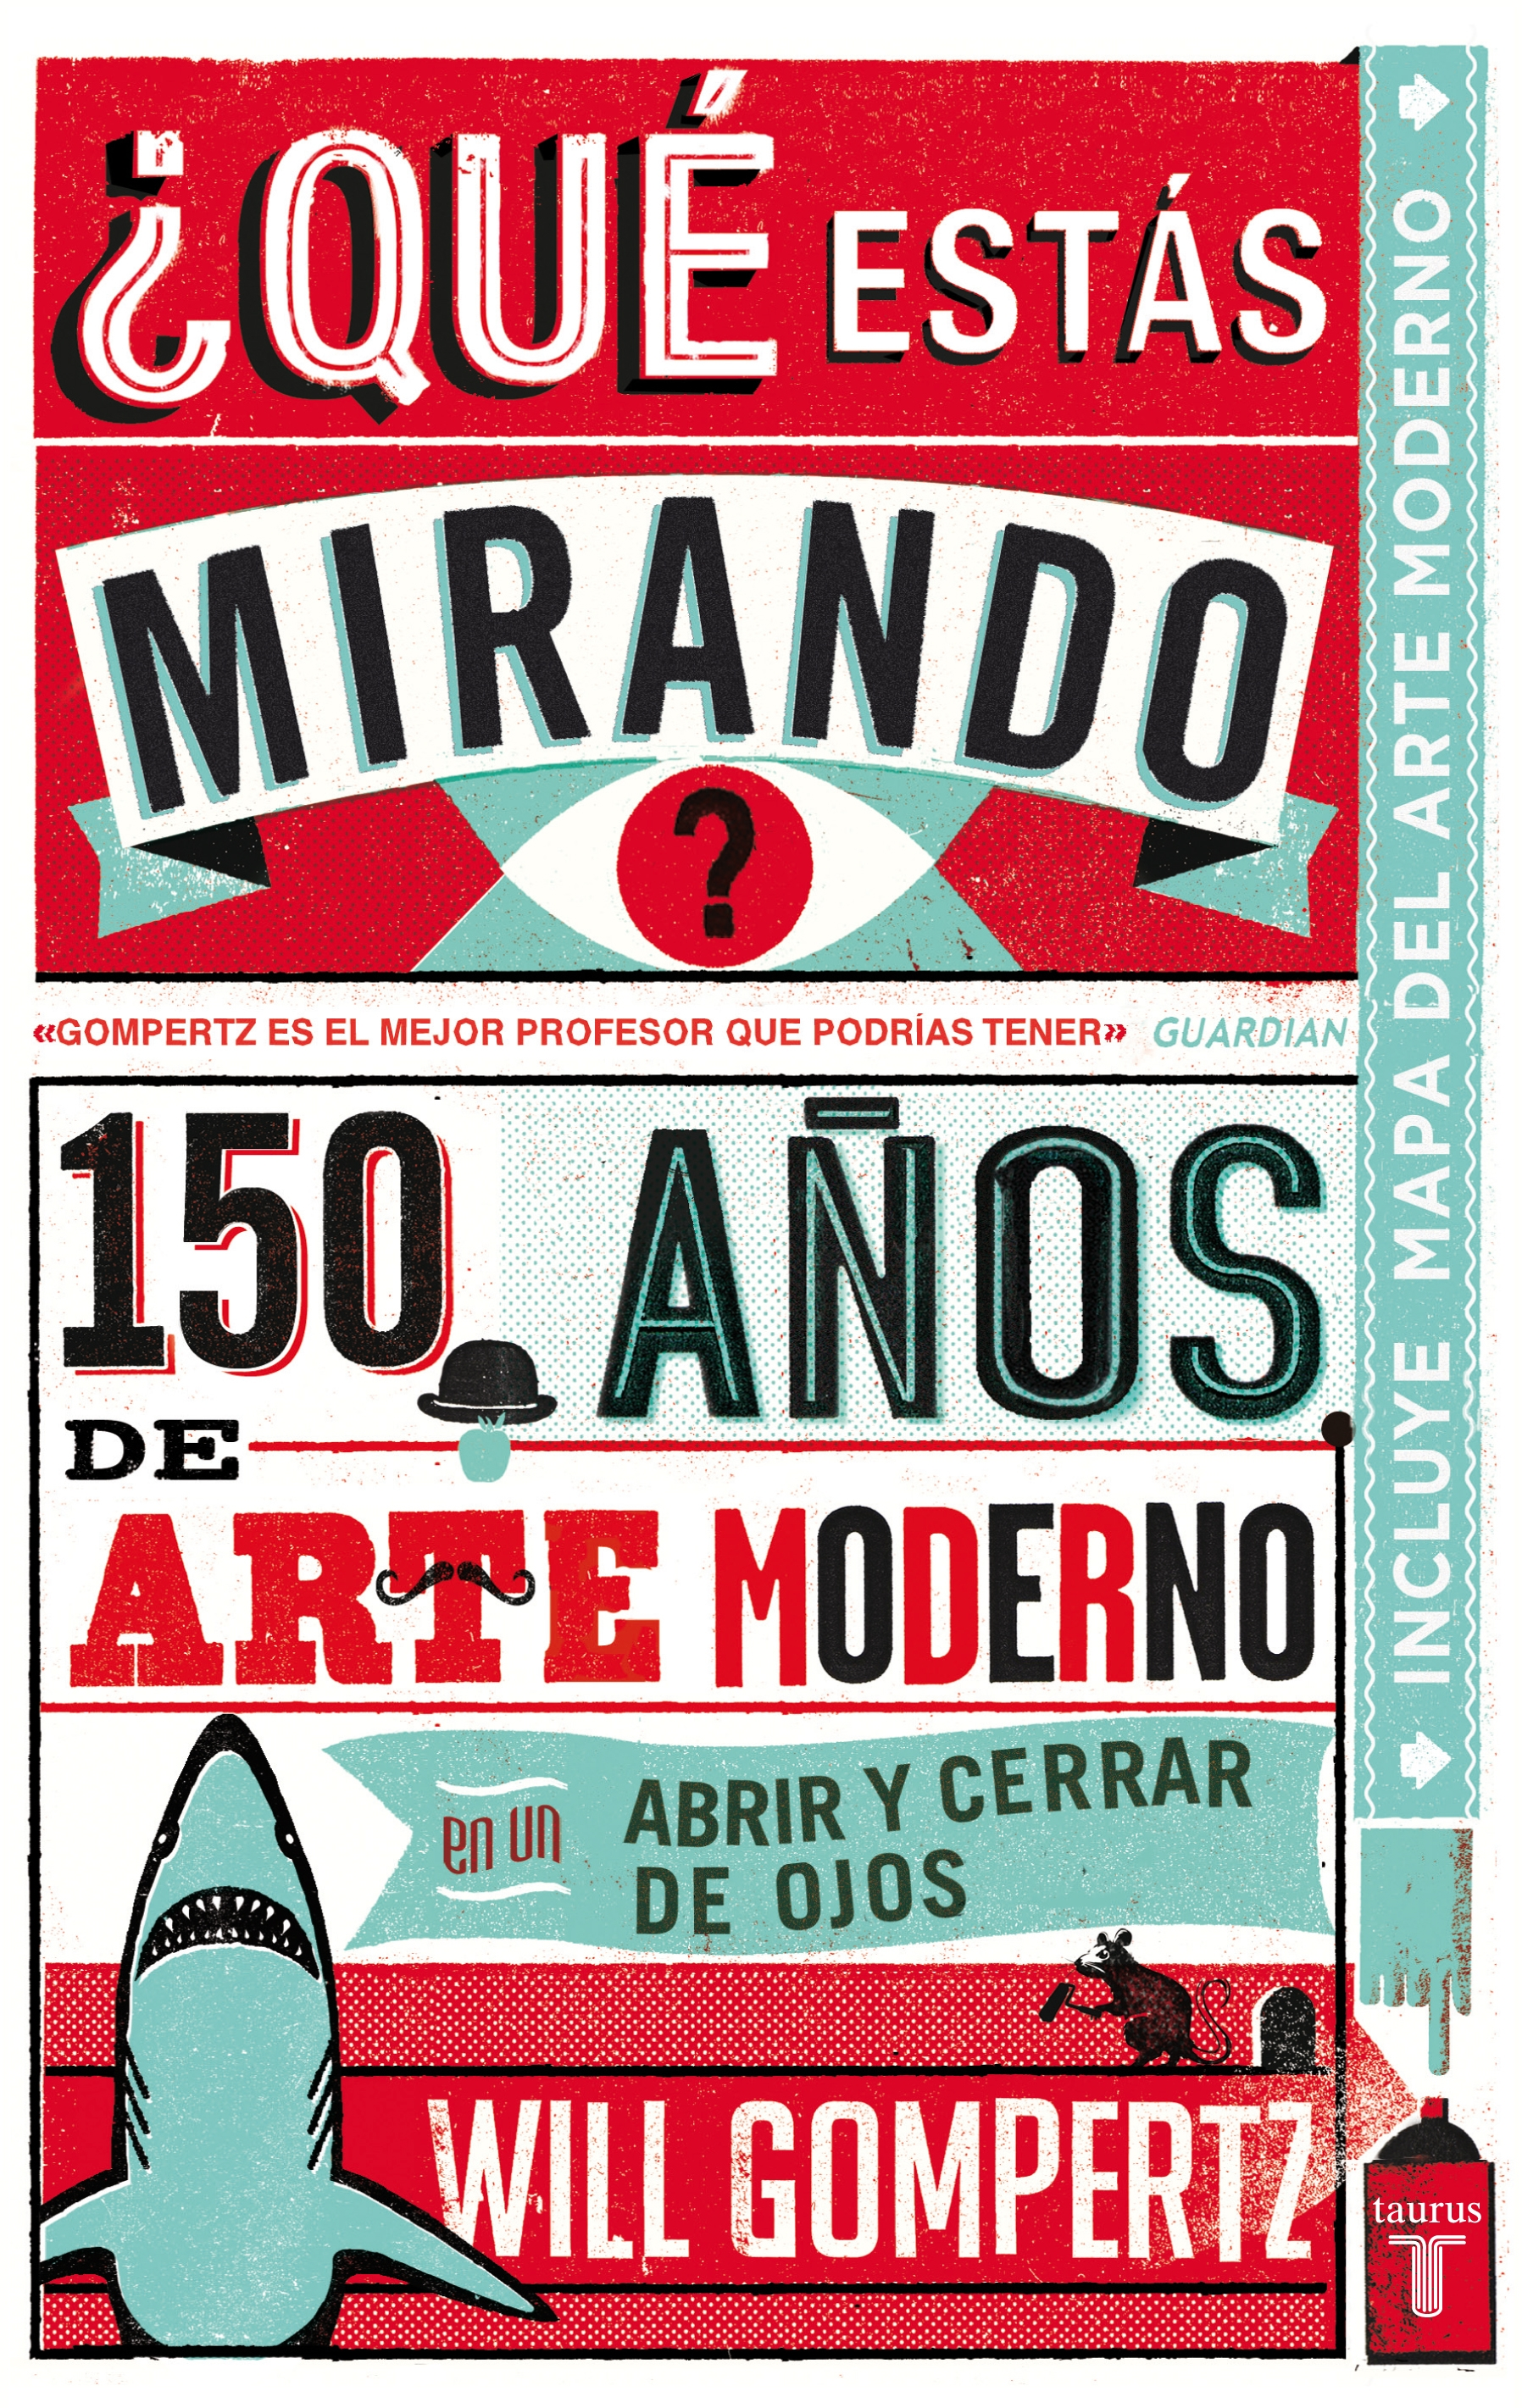 http://www.enredando.info/wp-content/uploads/2013/05/que-estas-mirando-ebook-9788430603091.jpg